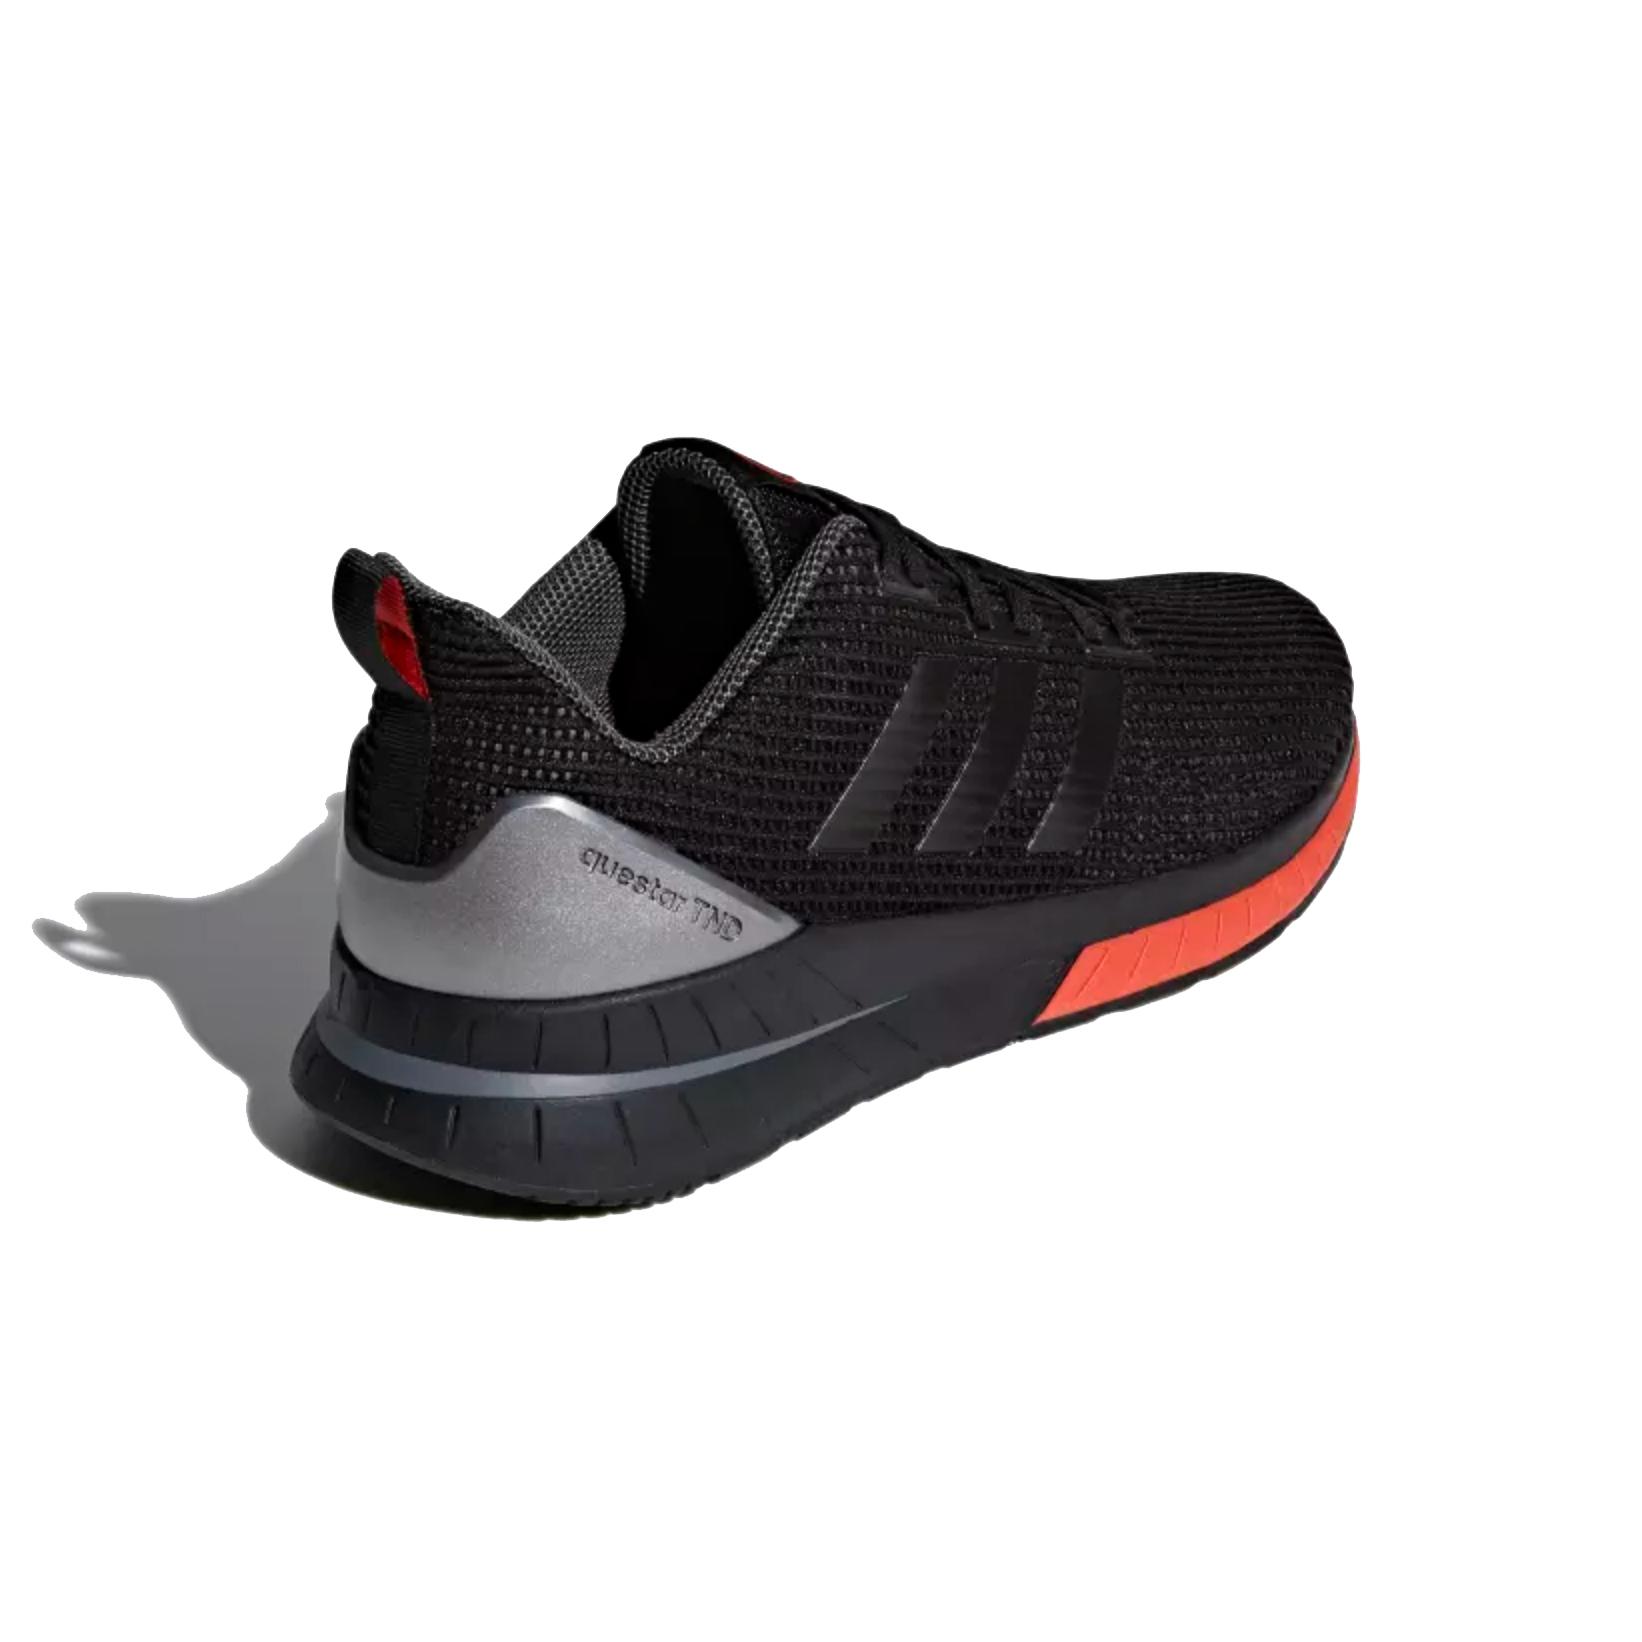 competitive price 9deaa 750b0 Adidas DB2543 Men s Questar TND Shoes, Core Black Core Black Core Red, 10.5